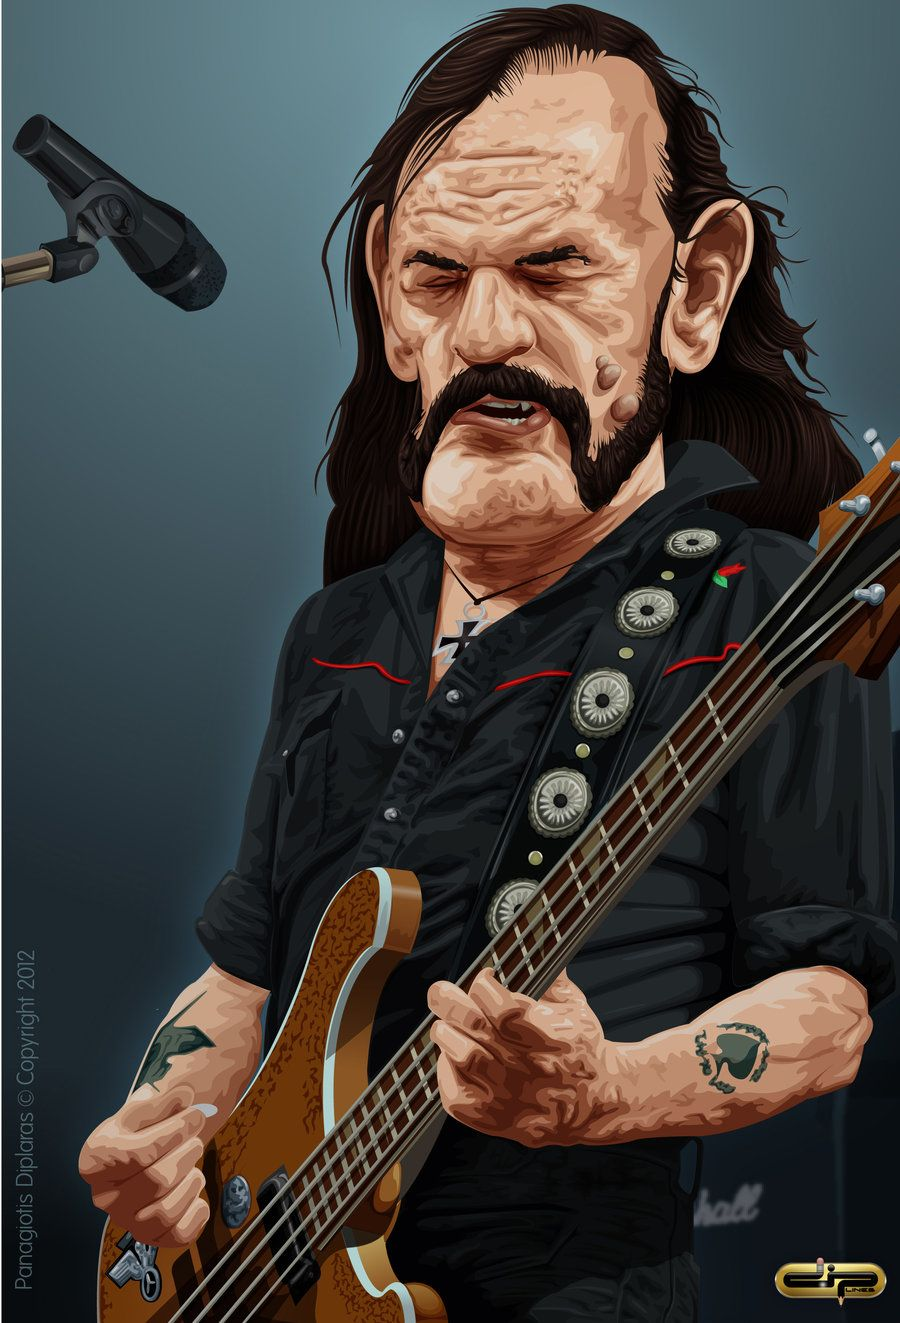 075d0d40a lemmy kilmister wiki - Google 検索 | music | Lemmy motorhead ...